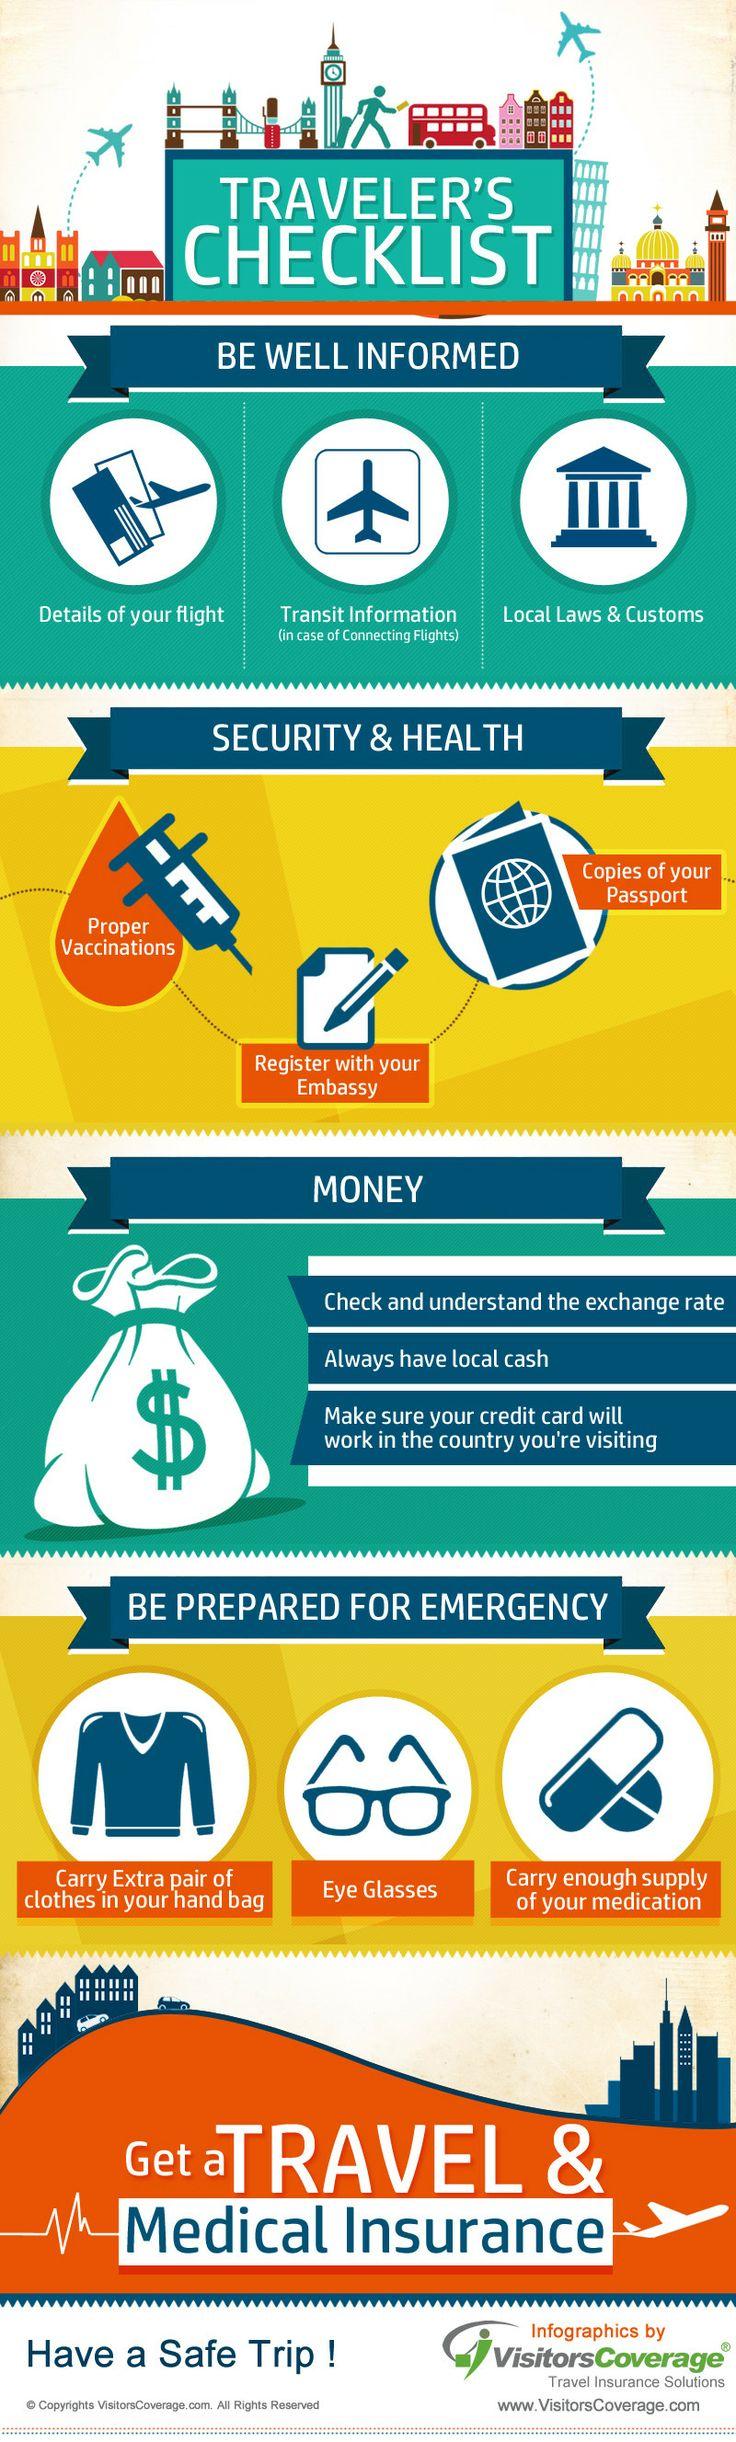 Traveler's Checklist   #infographic #Travel #Checklist #TravelHacks